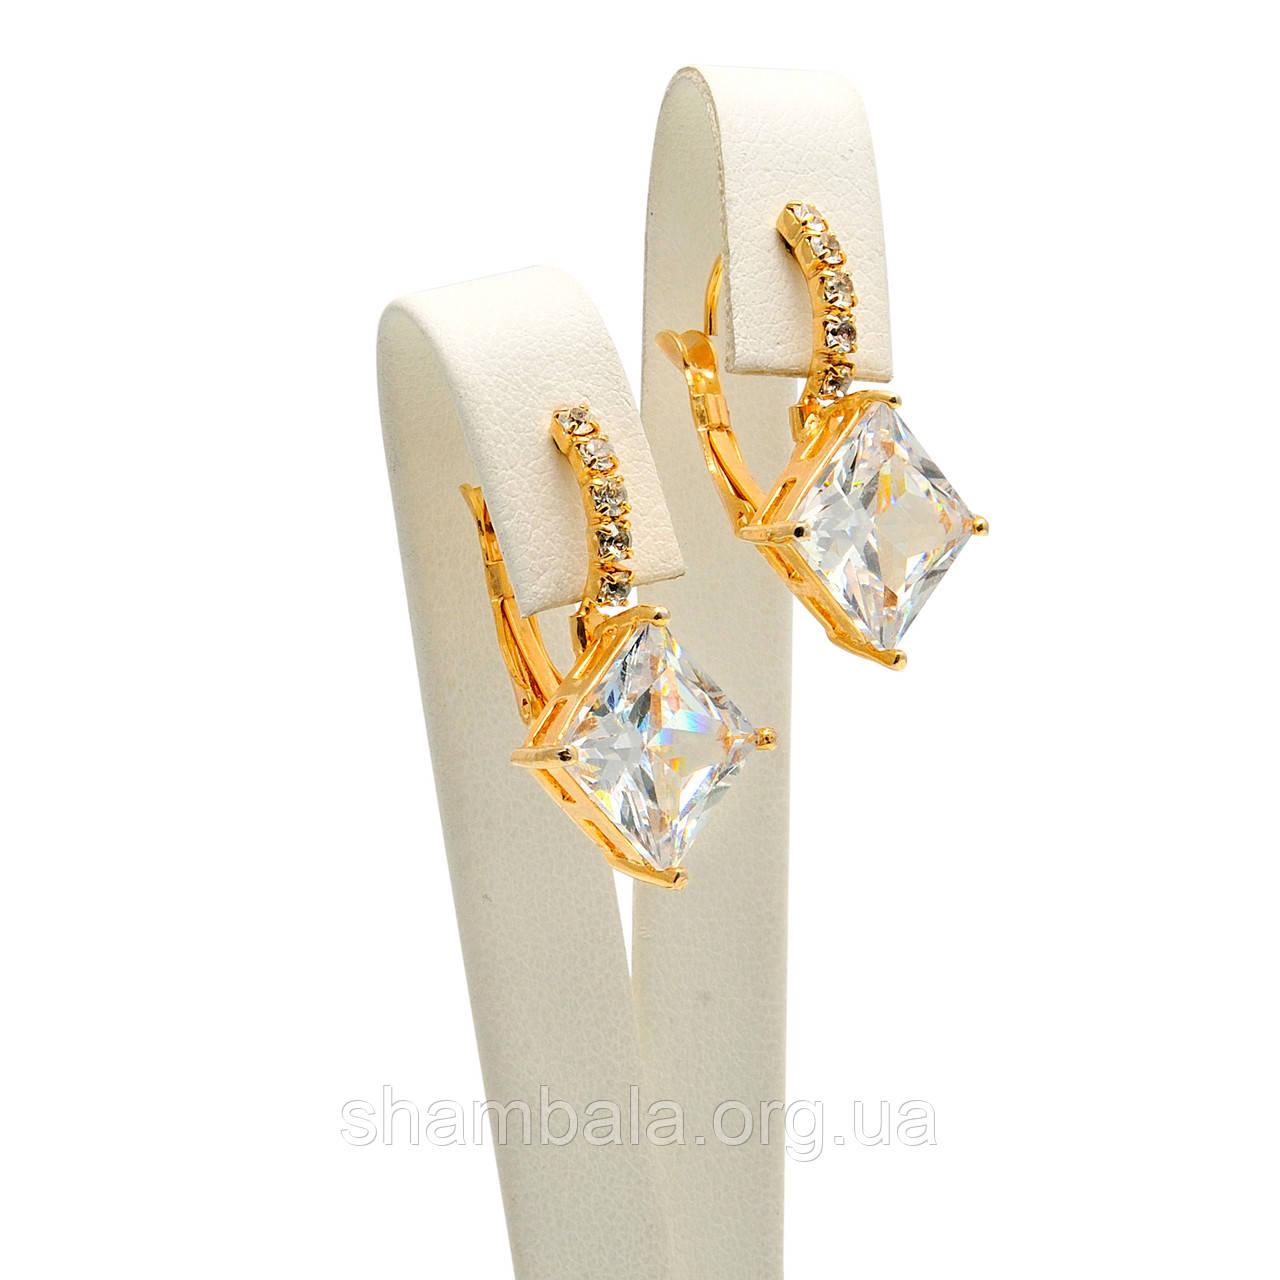 "Серьги Xuping Jewelry ""Ромб с камнем Swarovski"" позолота (017846)"